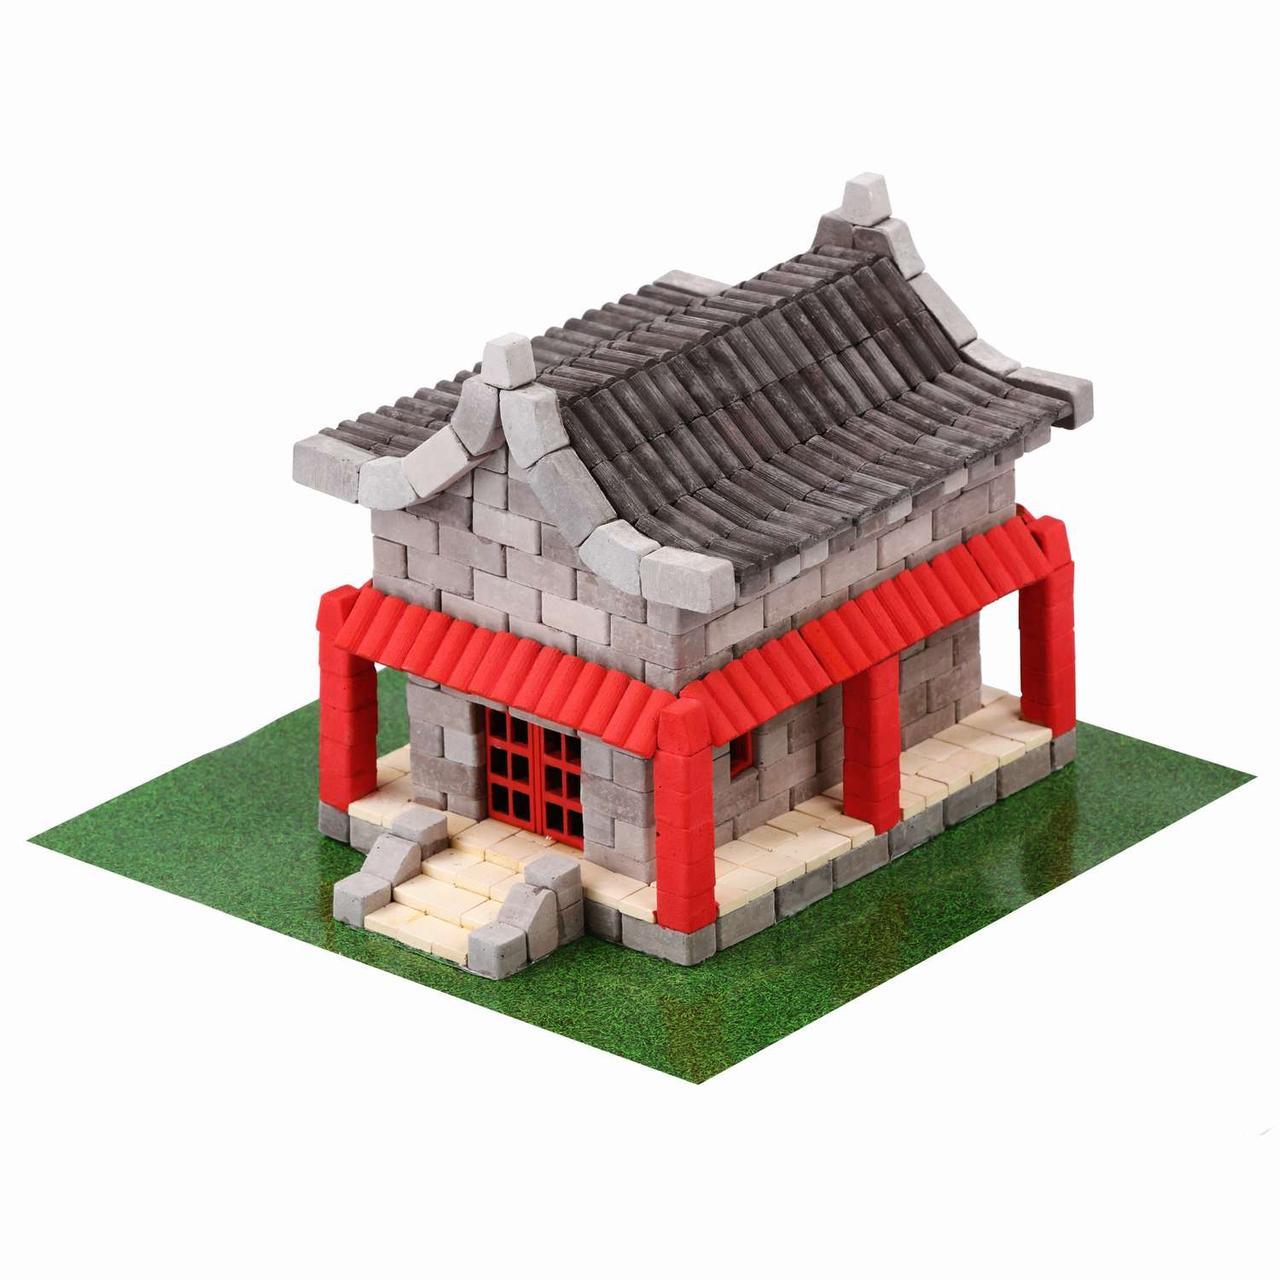 Конструктор керамический Країна замків і фортець Китайский домик 600 деталей (08004)